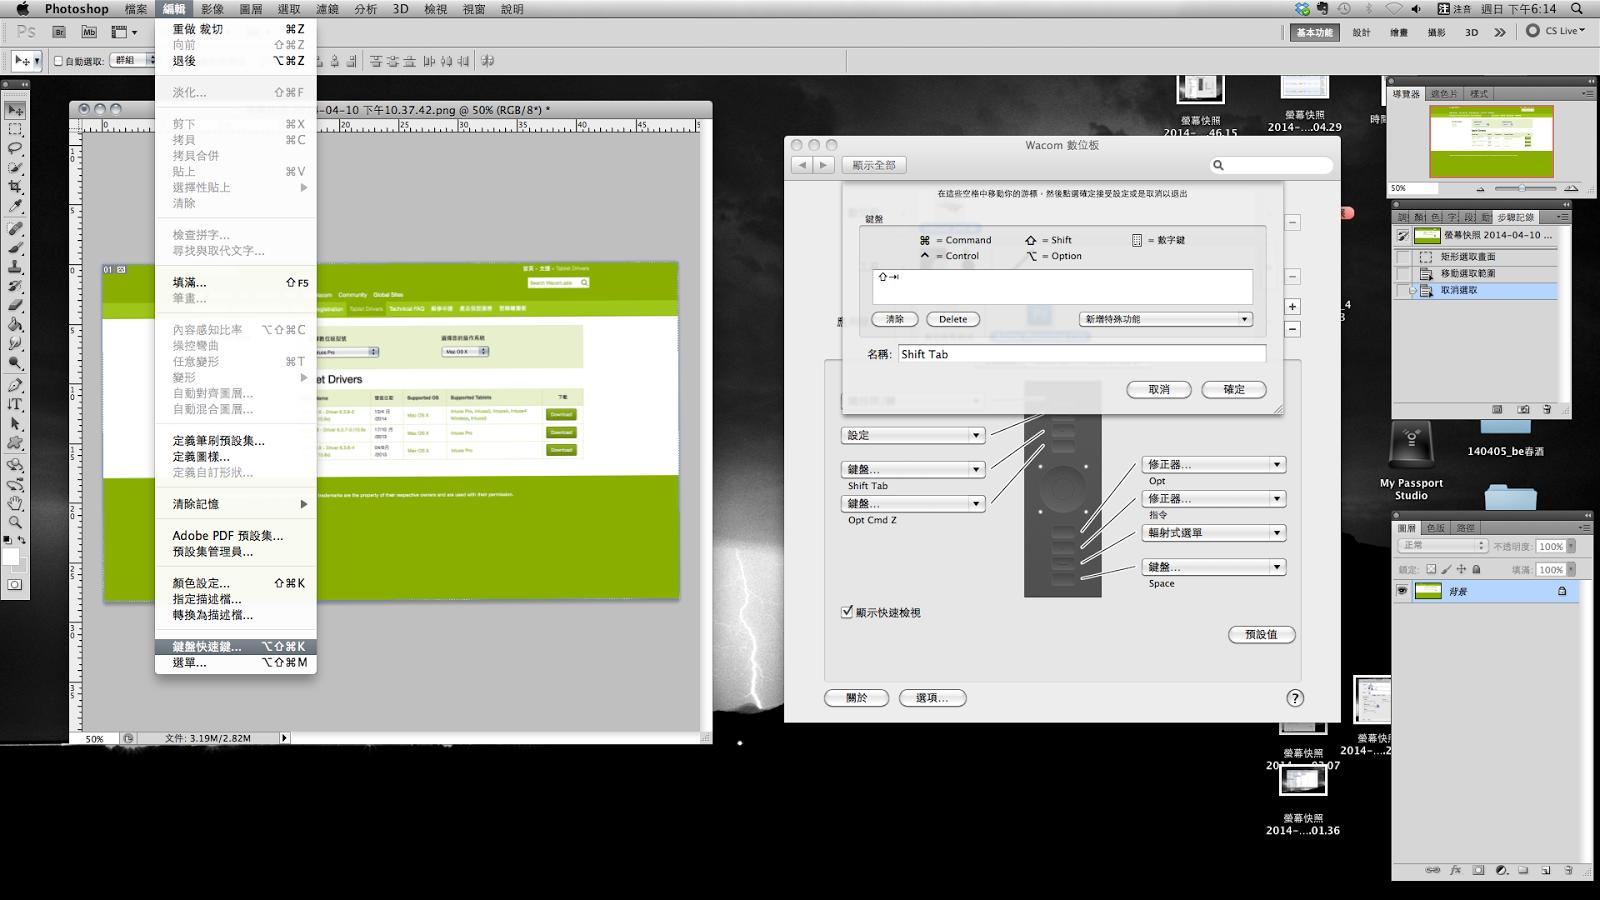 wacom pro pen&touch special 特別款_開箱 photoshop快速鍵設定(mac安裝問題)